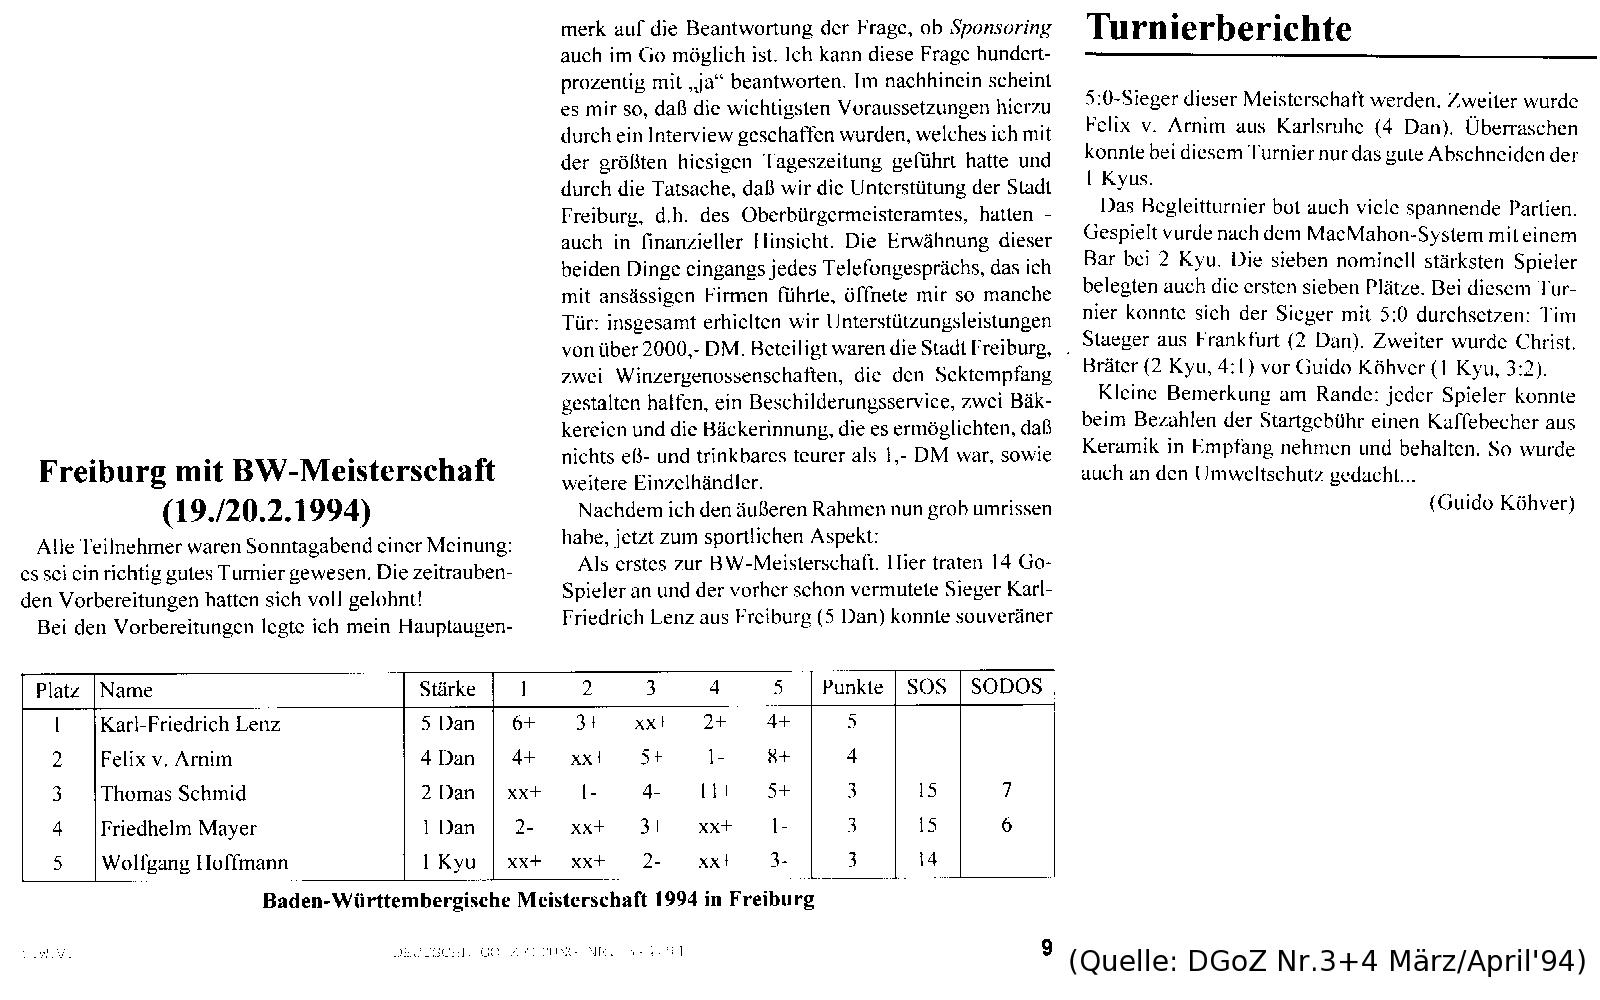 Bericht 1994